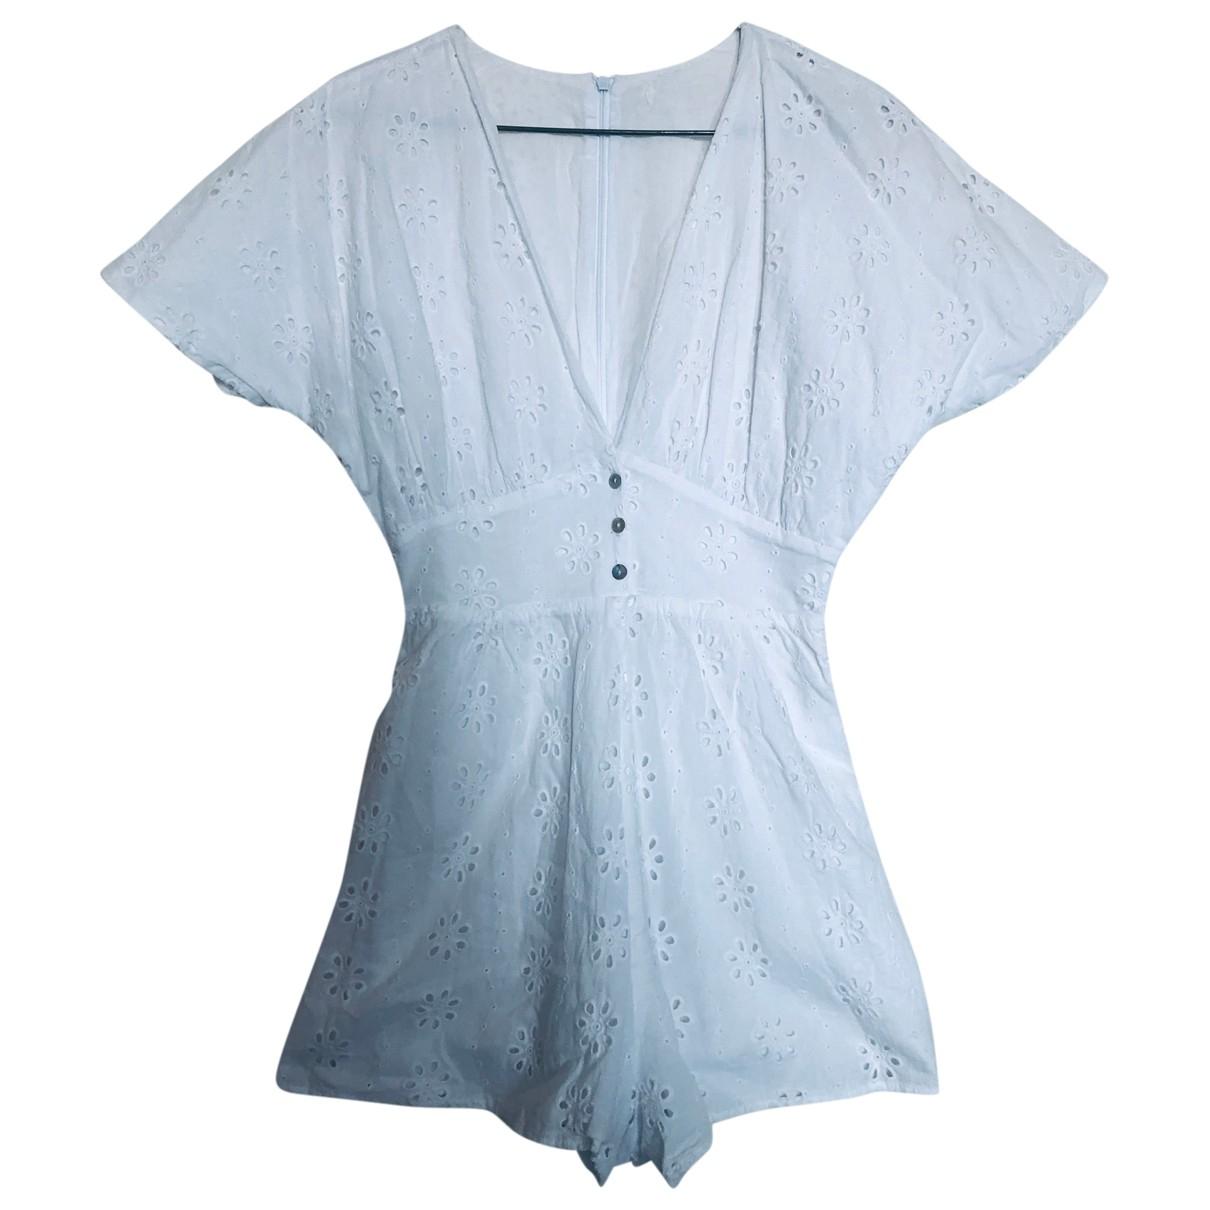 Zara - Combinaison   pour femme en coton - blanc